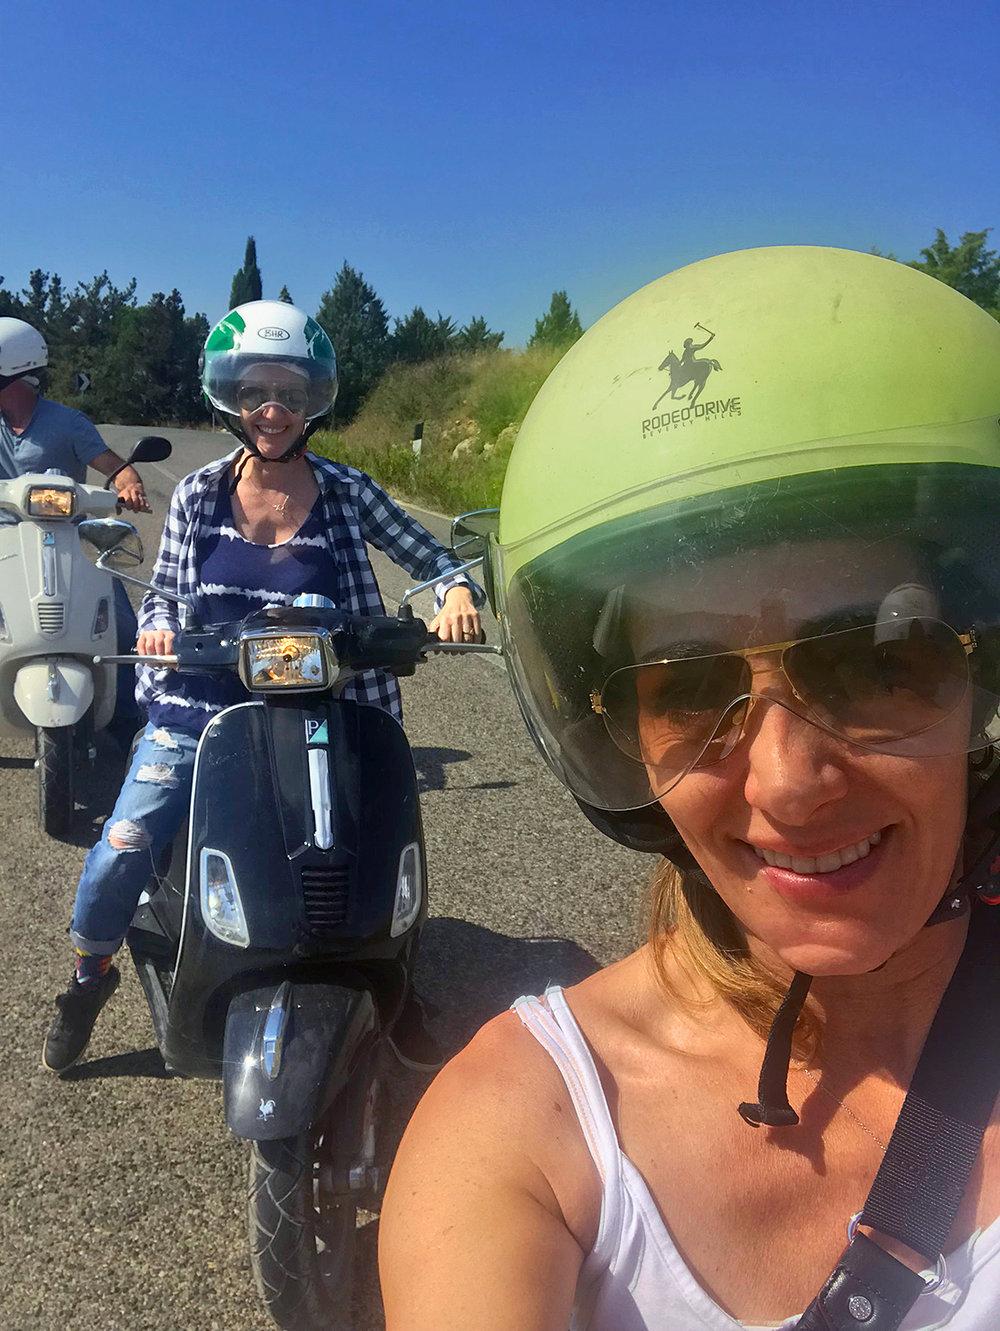 2018-ITALY_firenze_chianti-region_david_sara_lisa-scooters.jpg